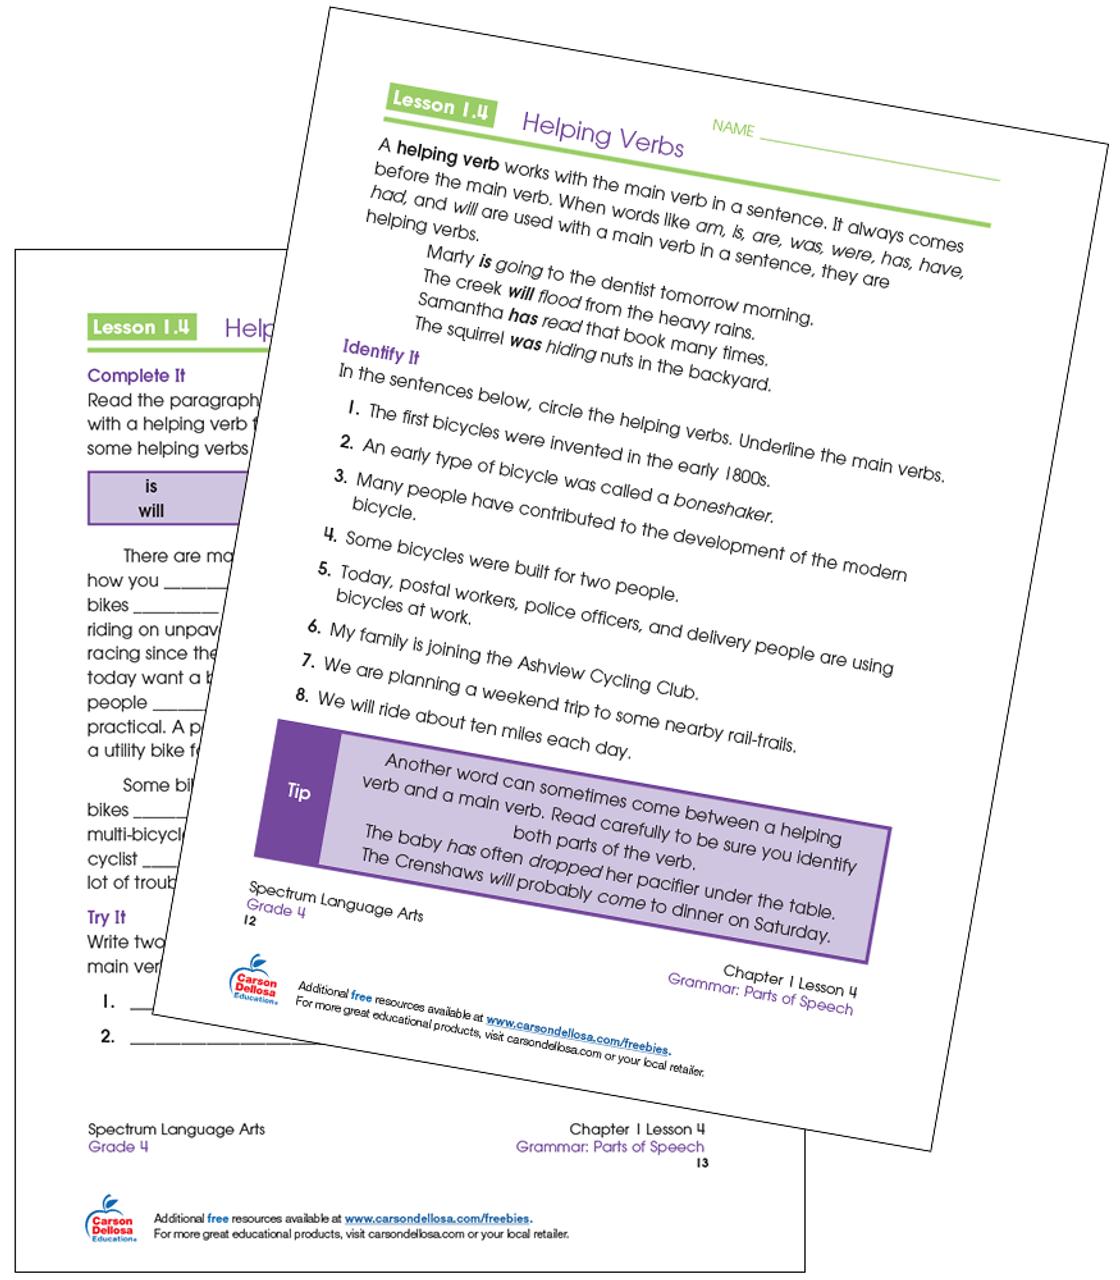 Helping Verbs Grade 4 Free Printable   Carson Dellosa [ 1280 x 1120 Pixel ]